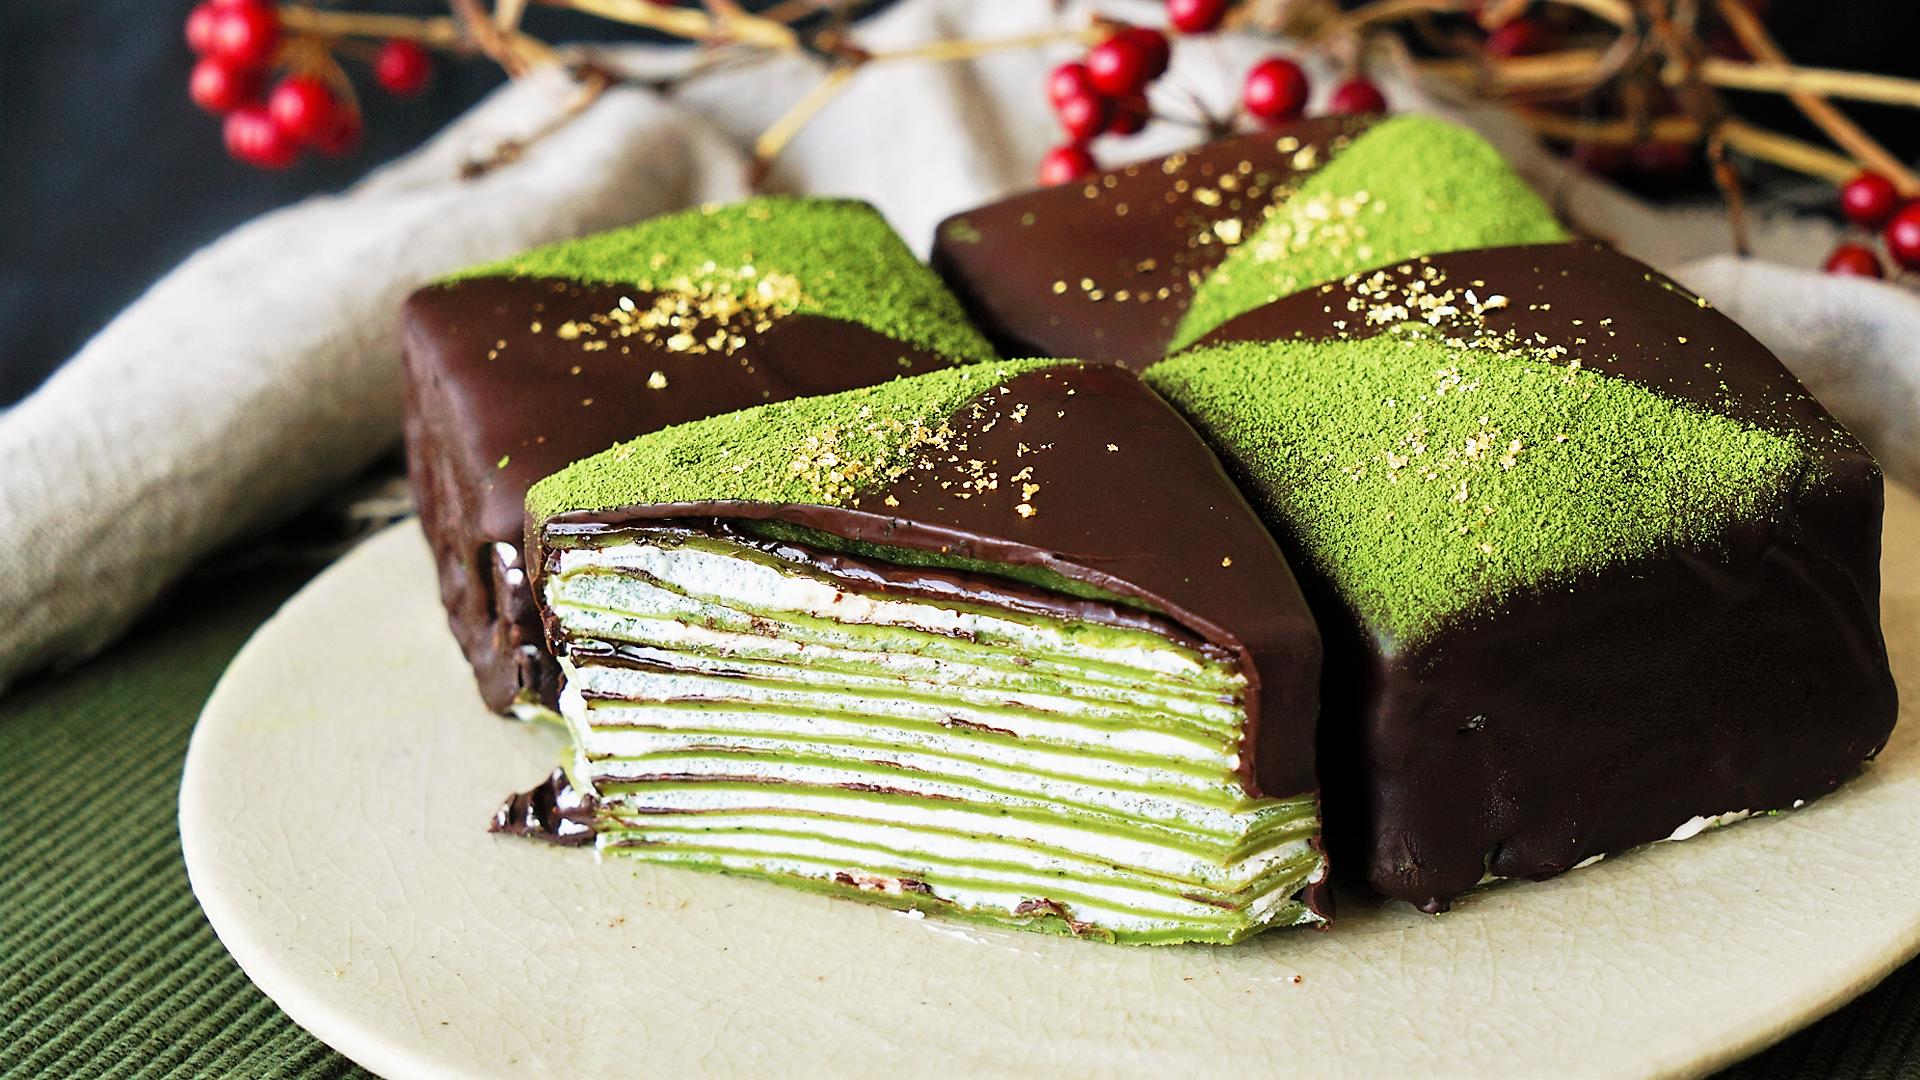 Layered Mini Matcha Cakes